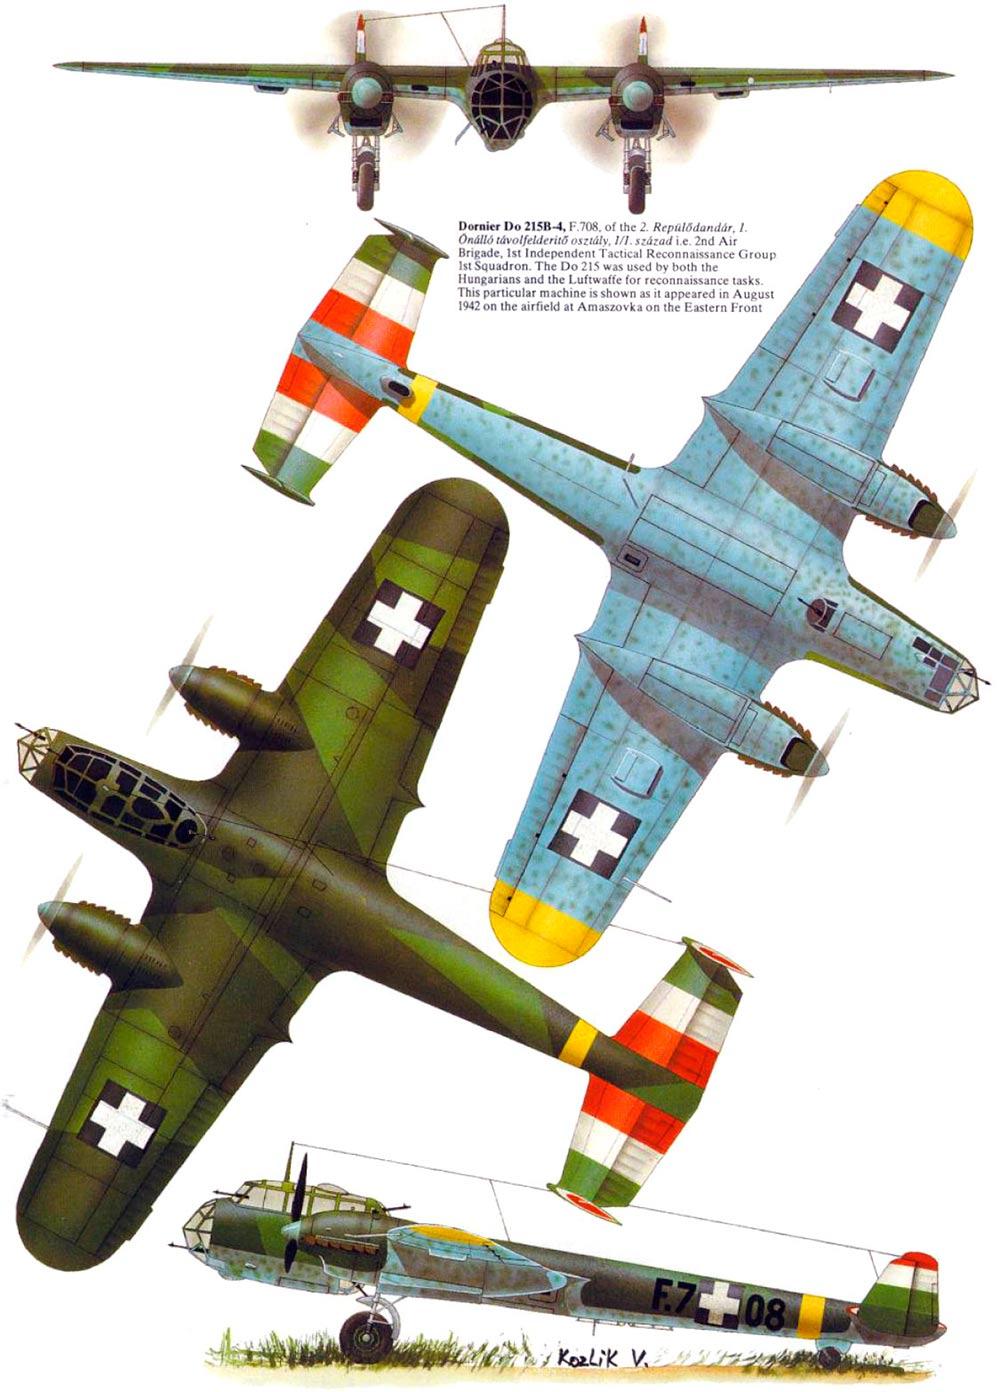 Проекции бомбардировщика Дорнье 215 (Do-215)